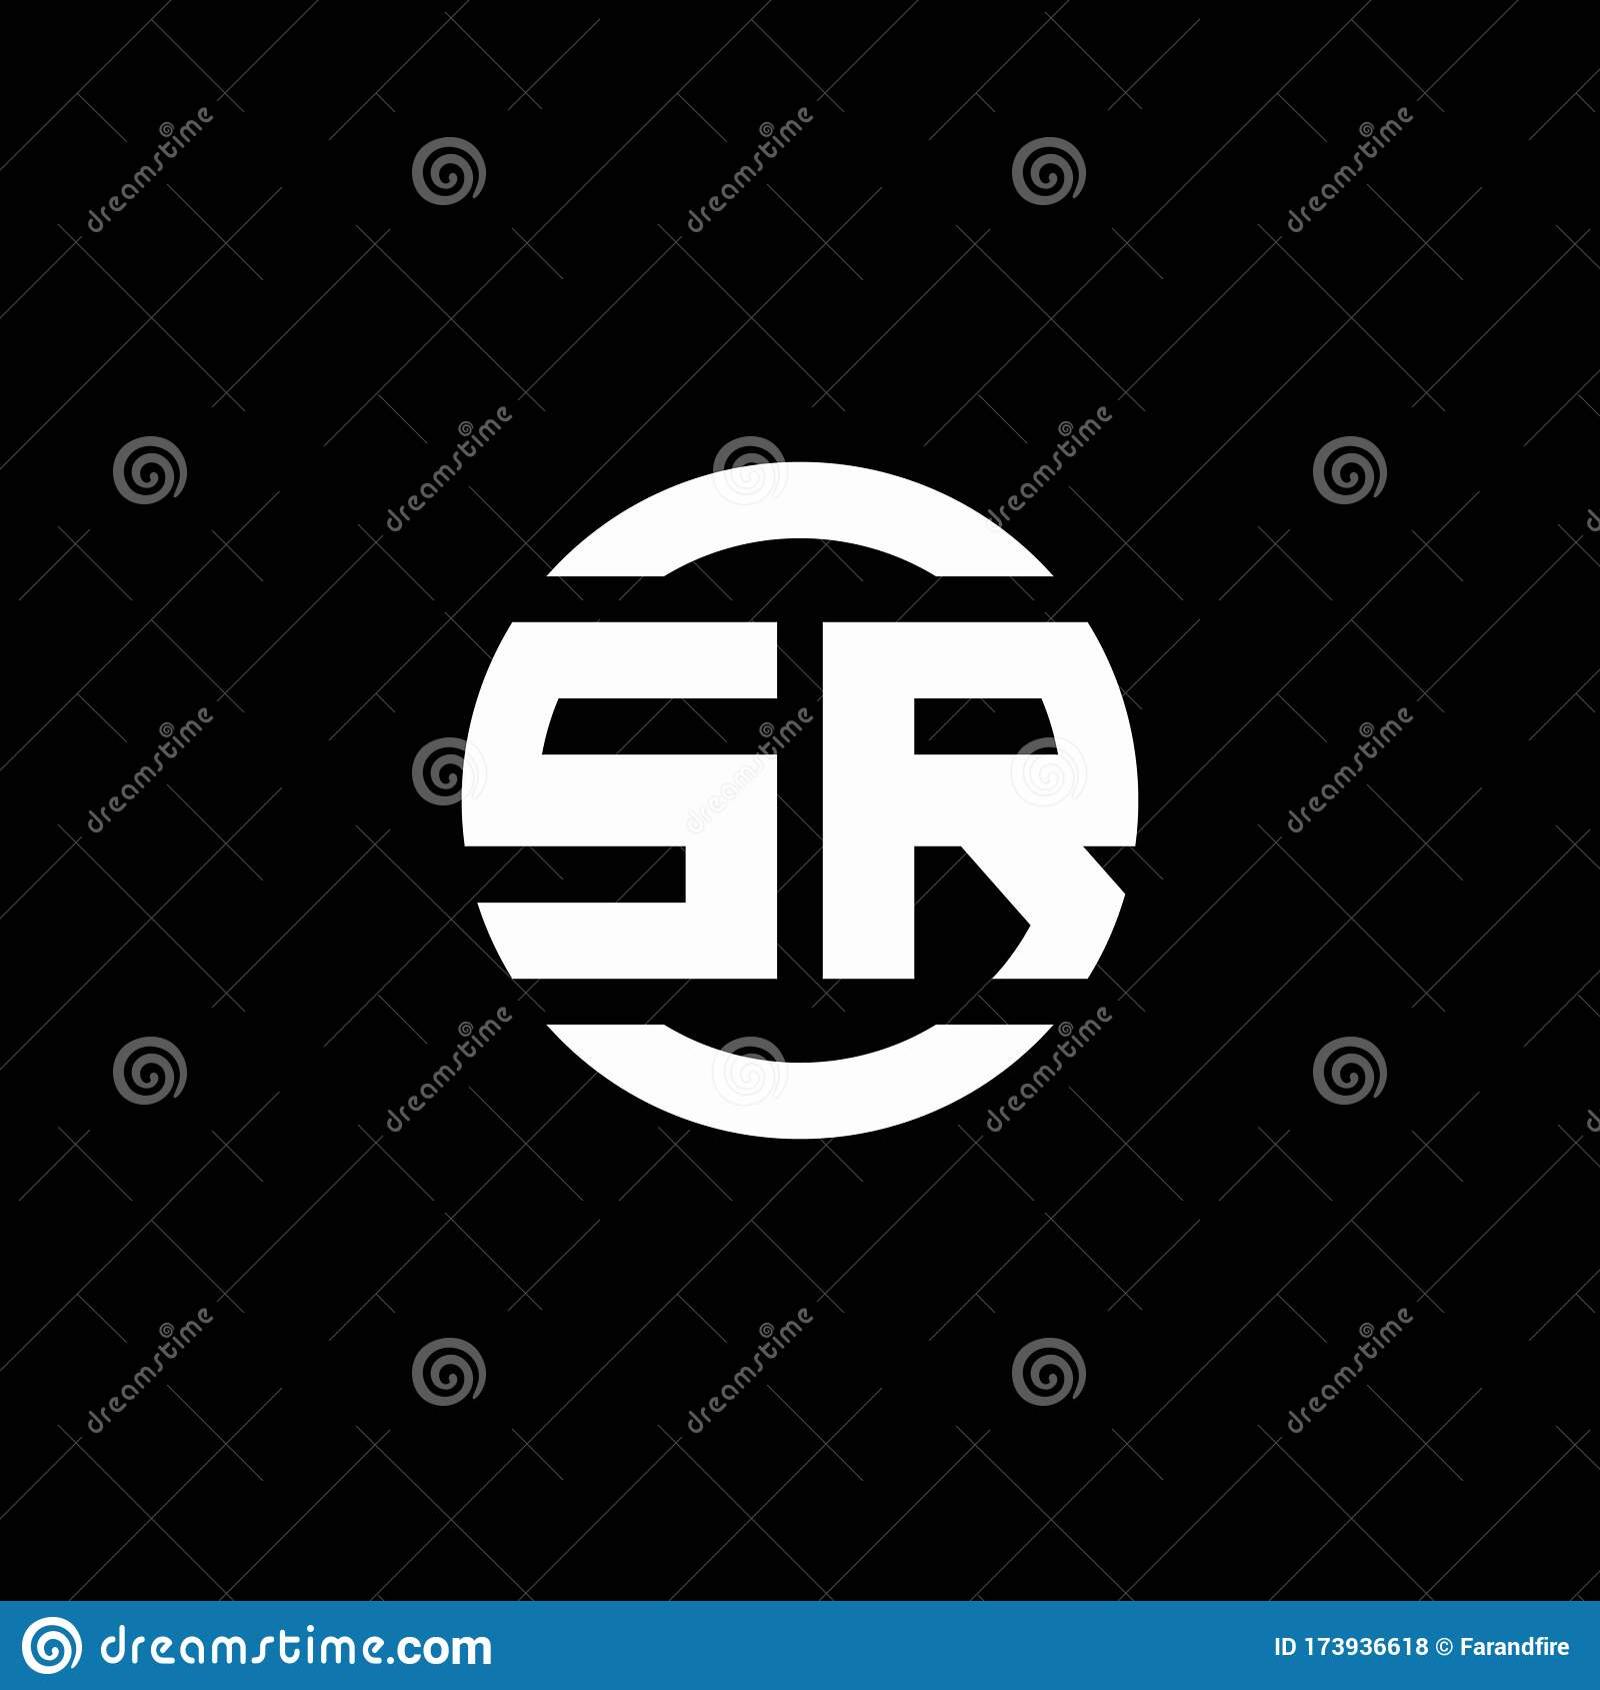 Sr Logo Monogram Isolated On Circle Element Design Template Stock Vector Illustration Of Corporate Logos 173936618